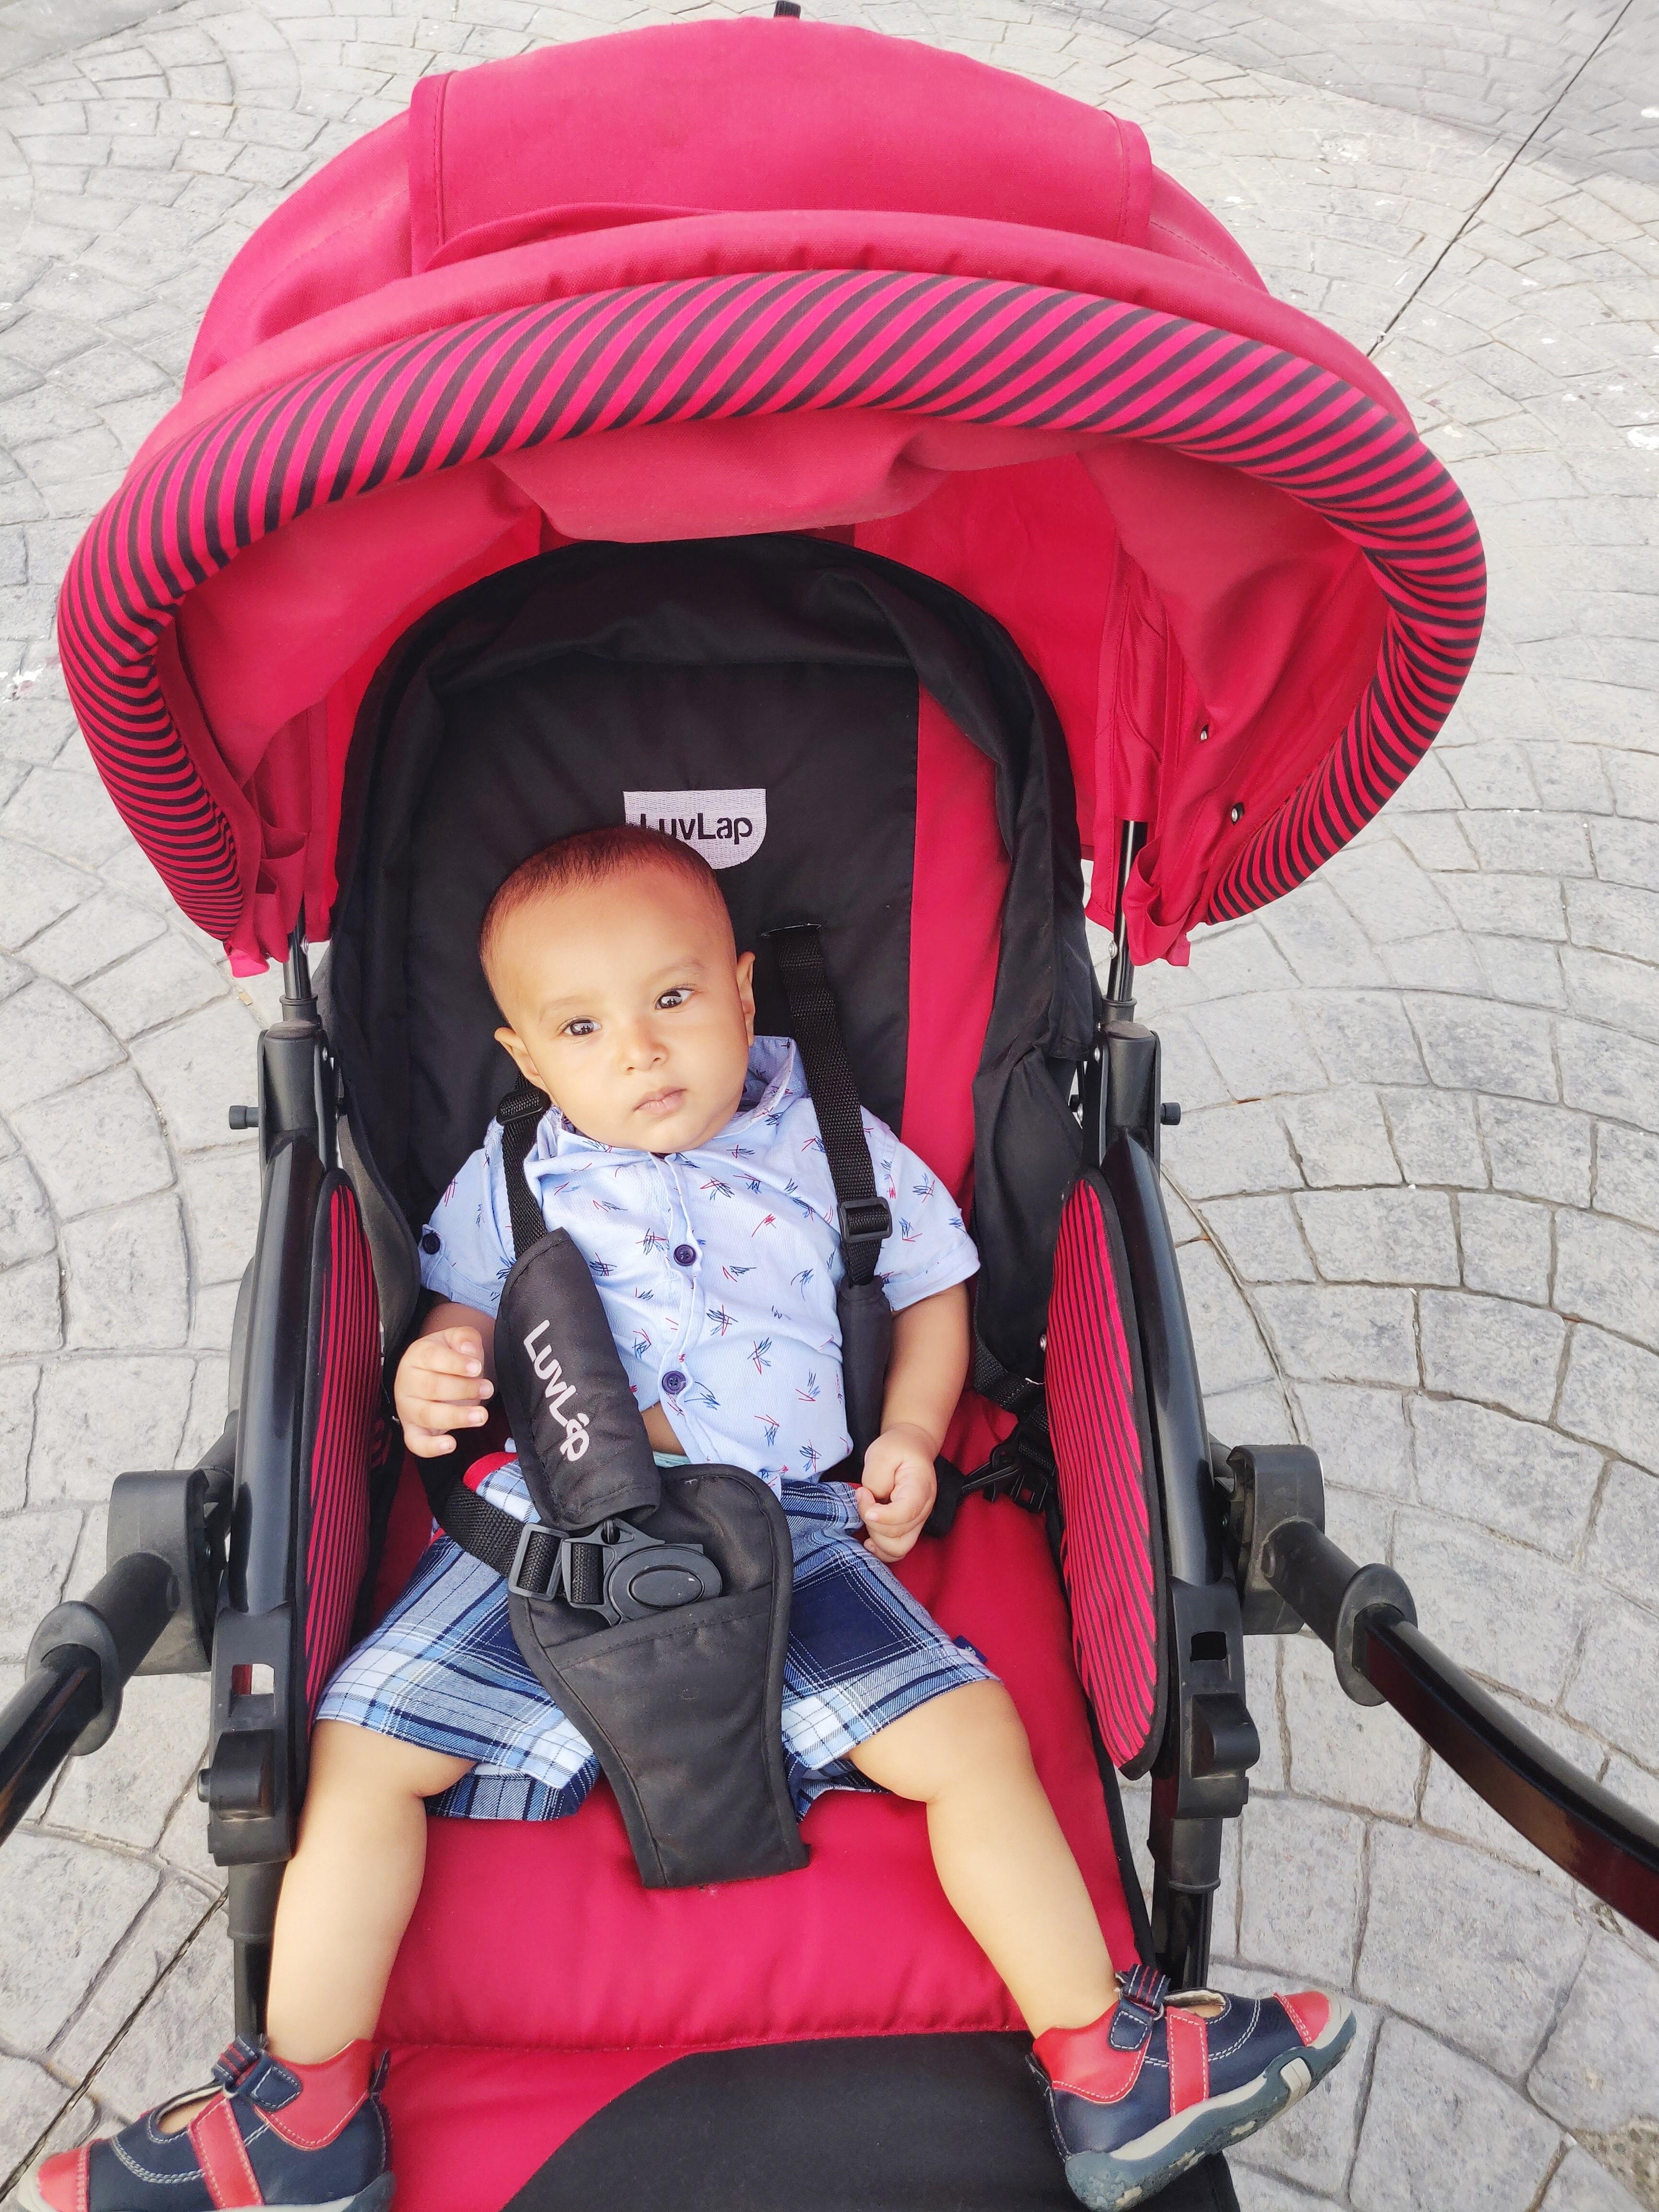 LuvLap Galaxy Baby Stroller-Good and helpful-By sabina